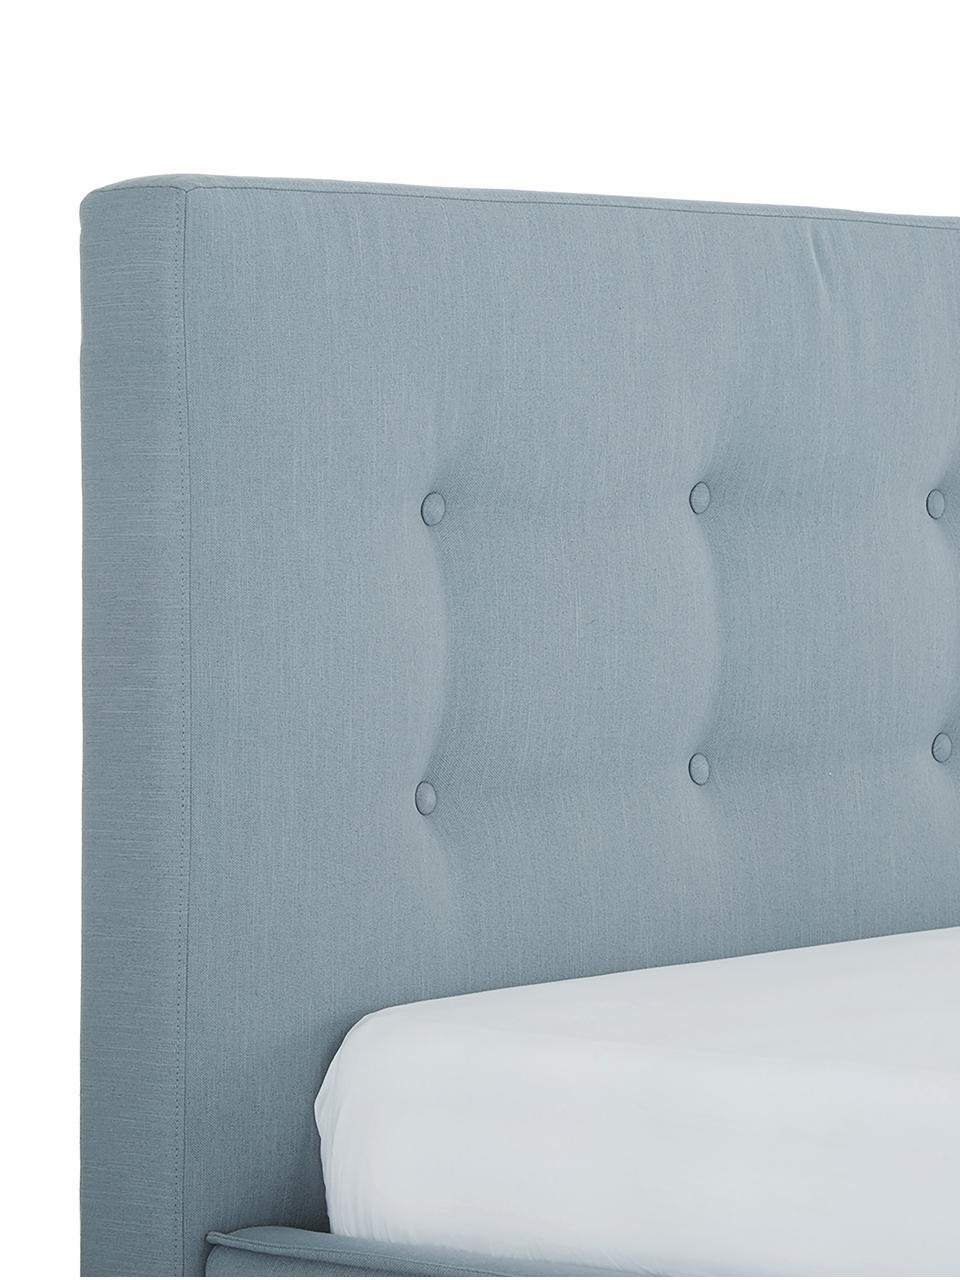 Polsterbett Moon, Korpus: Massives Kiefernholz und , Füße: Massives Eichenholz, Bezug: Polyester (Strukturstoff), Blaugrau, 160 x 200 cm